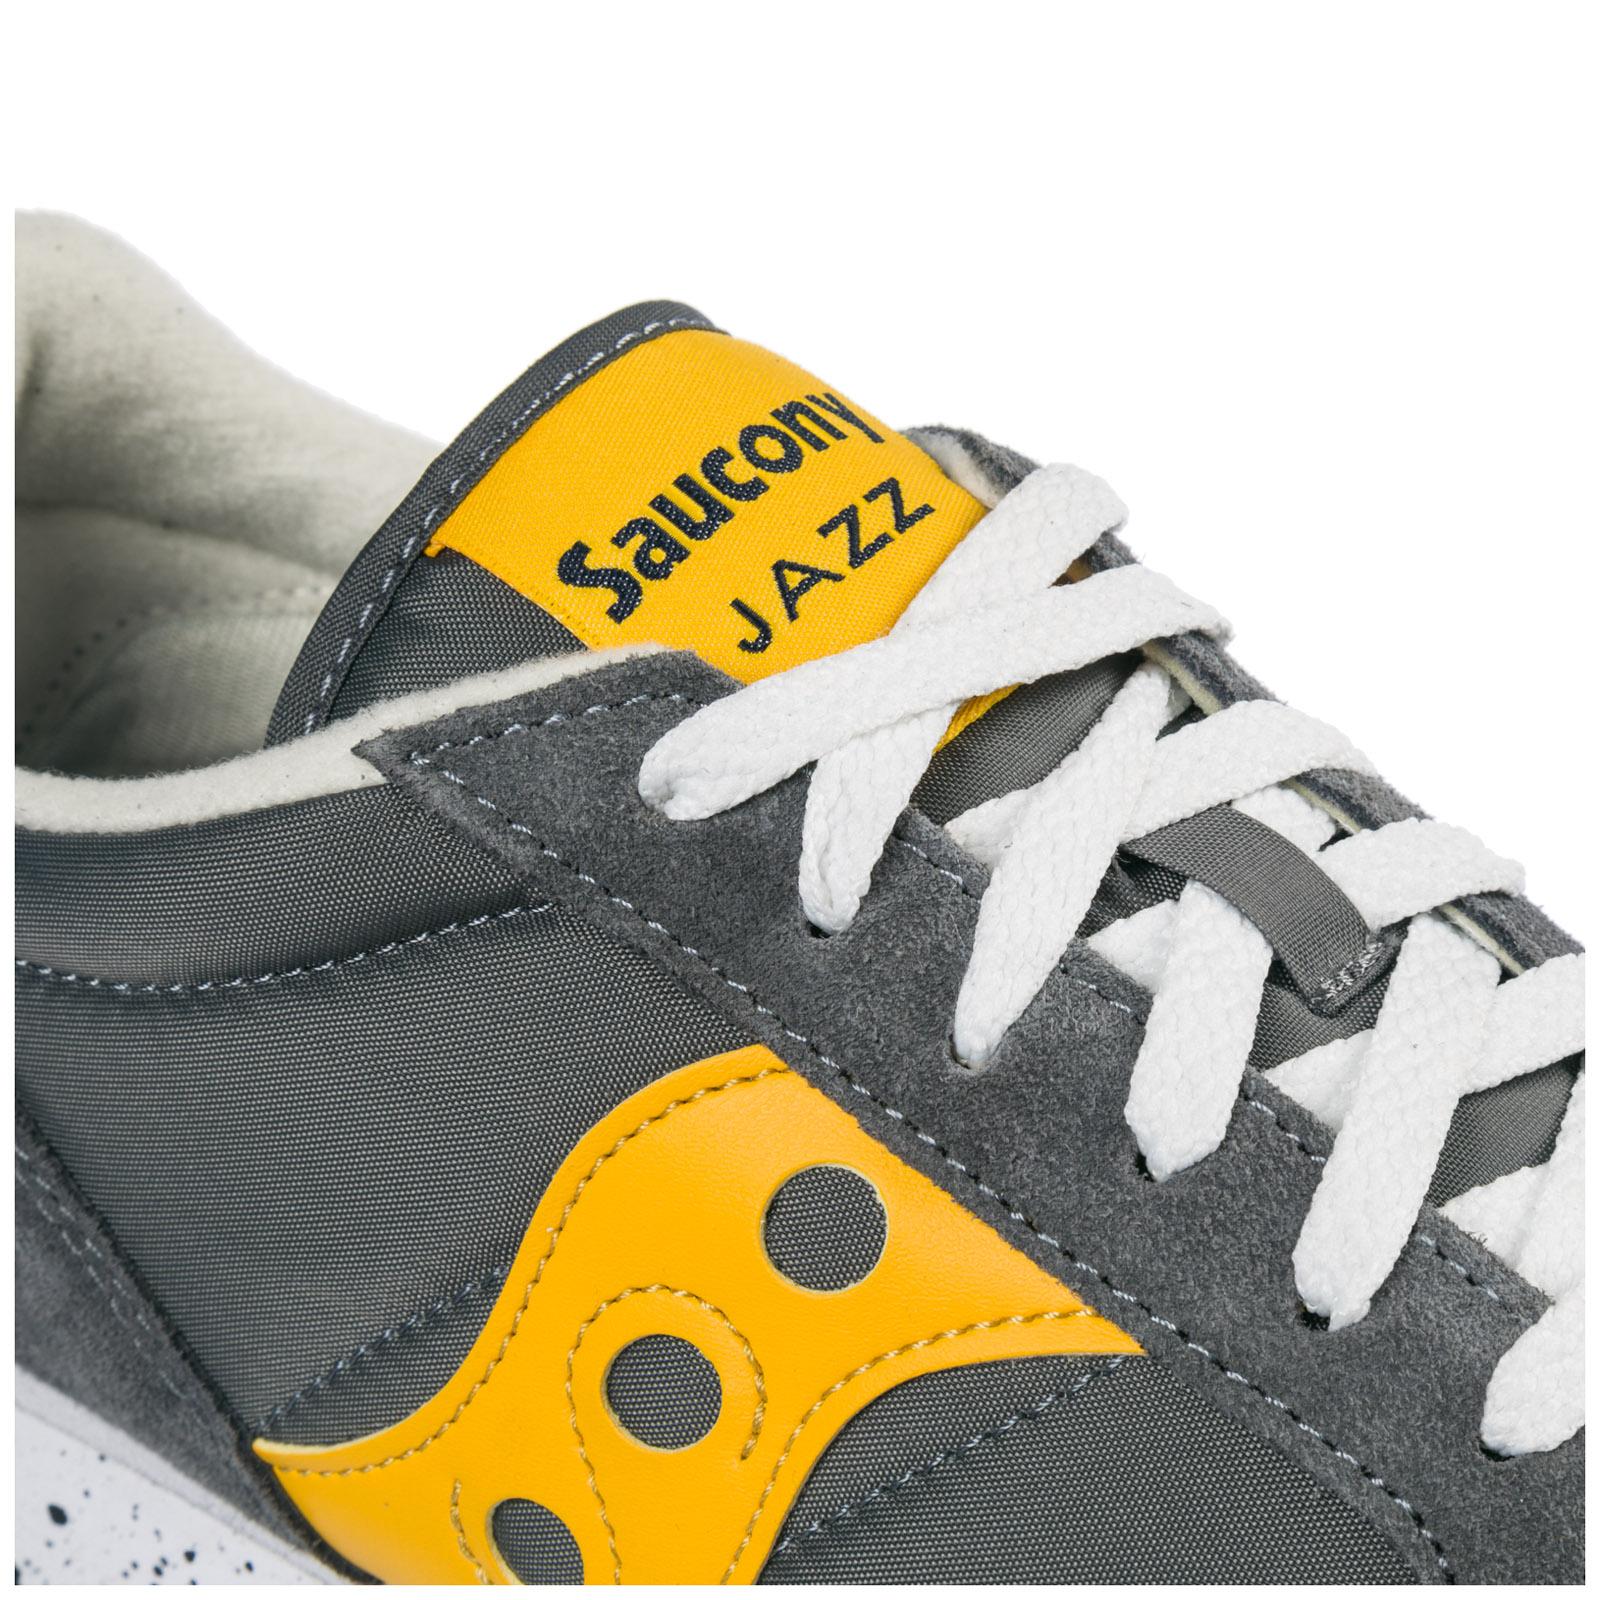 Saucony Giallo Grigio 2044417 Grigio Saucony Sneakers Giallo Sneakers 2044417 CWoxerdB